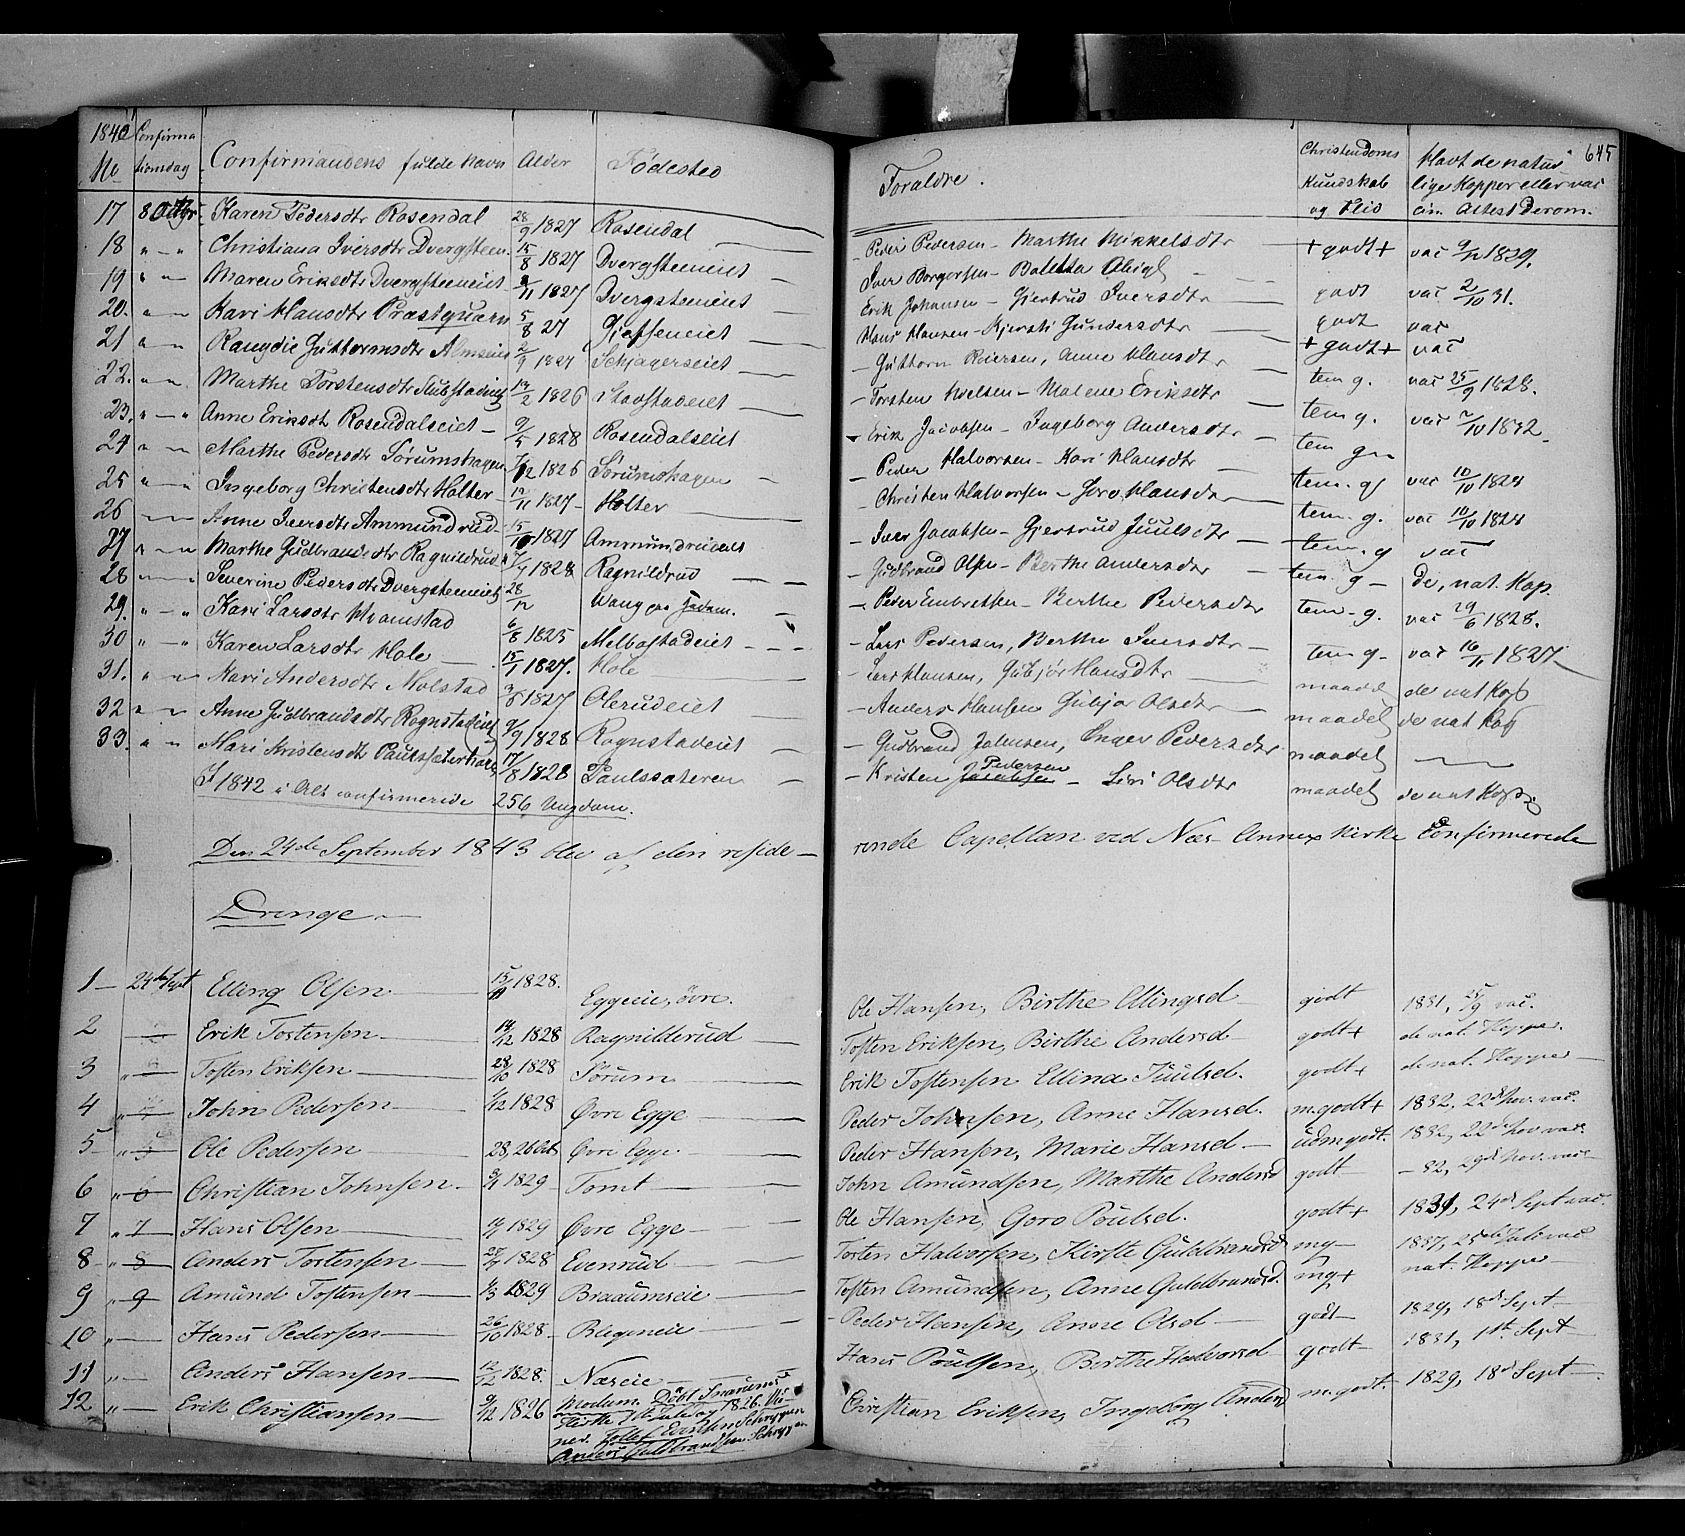 SAH, Gran prestekontor, Ministerialbok nr. 11, 1842-1856, s. 644-645